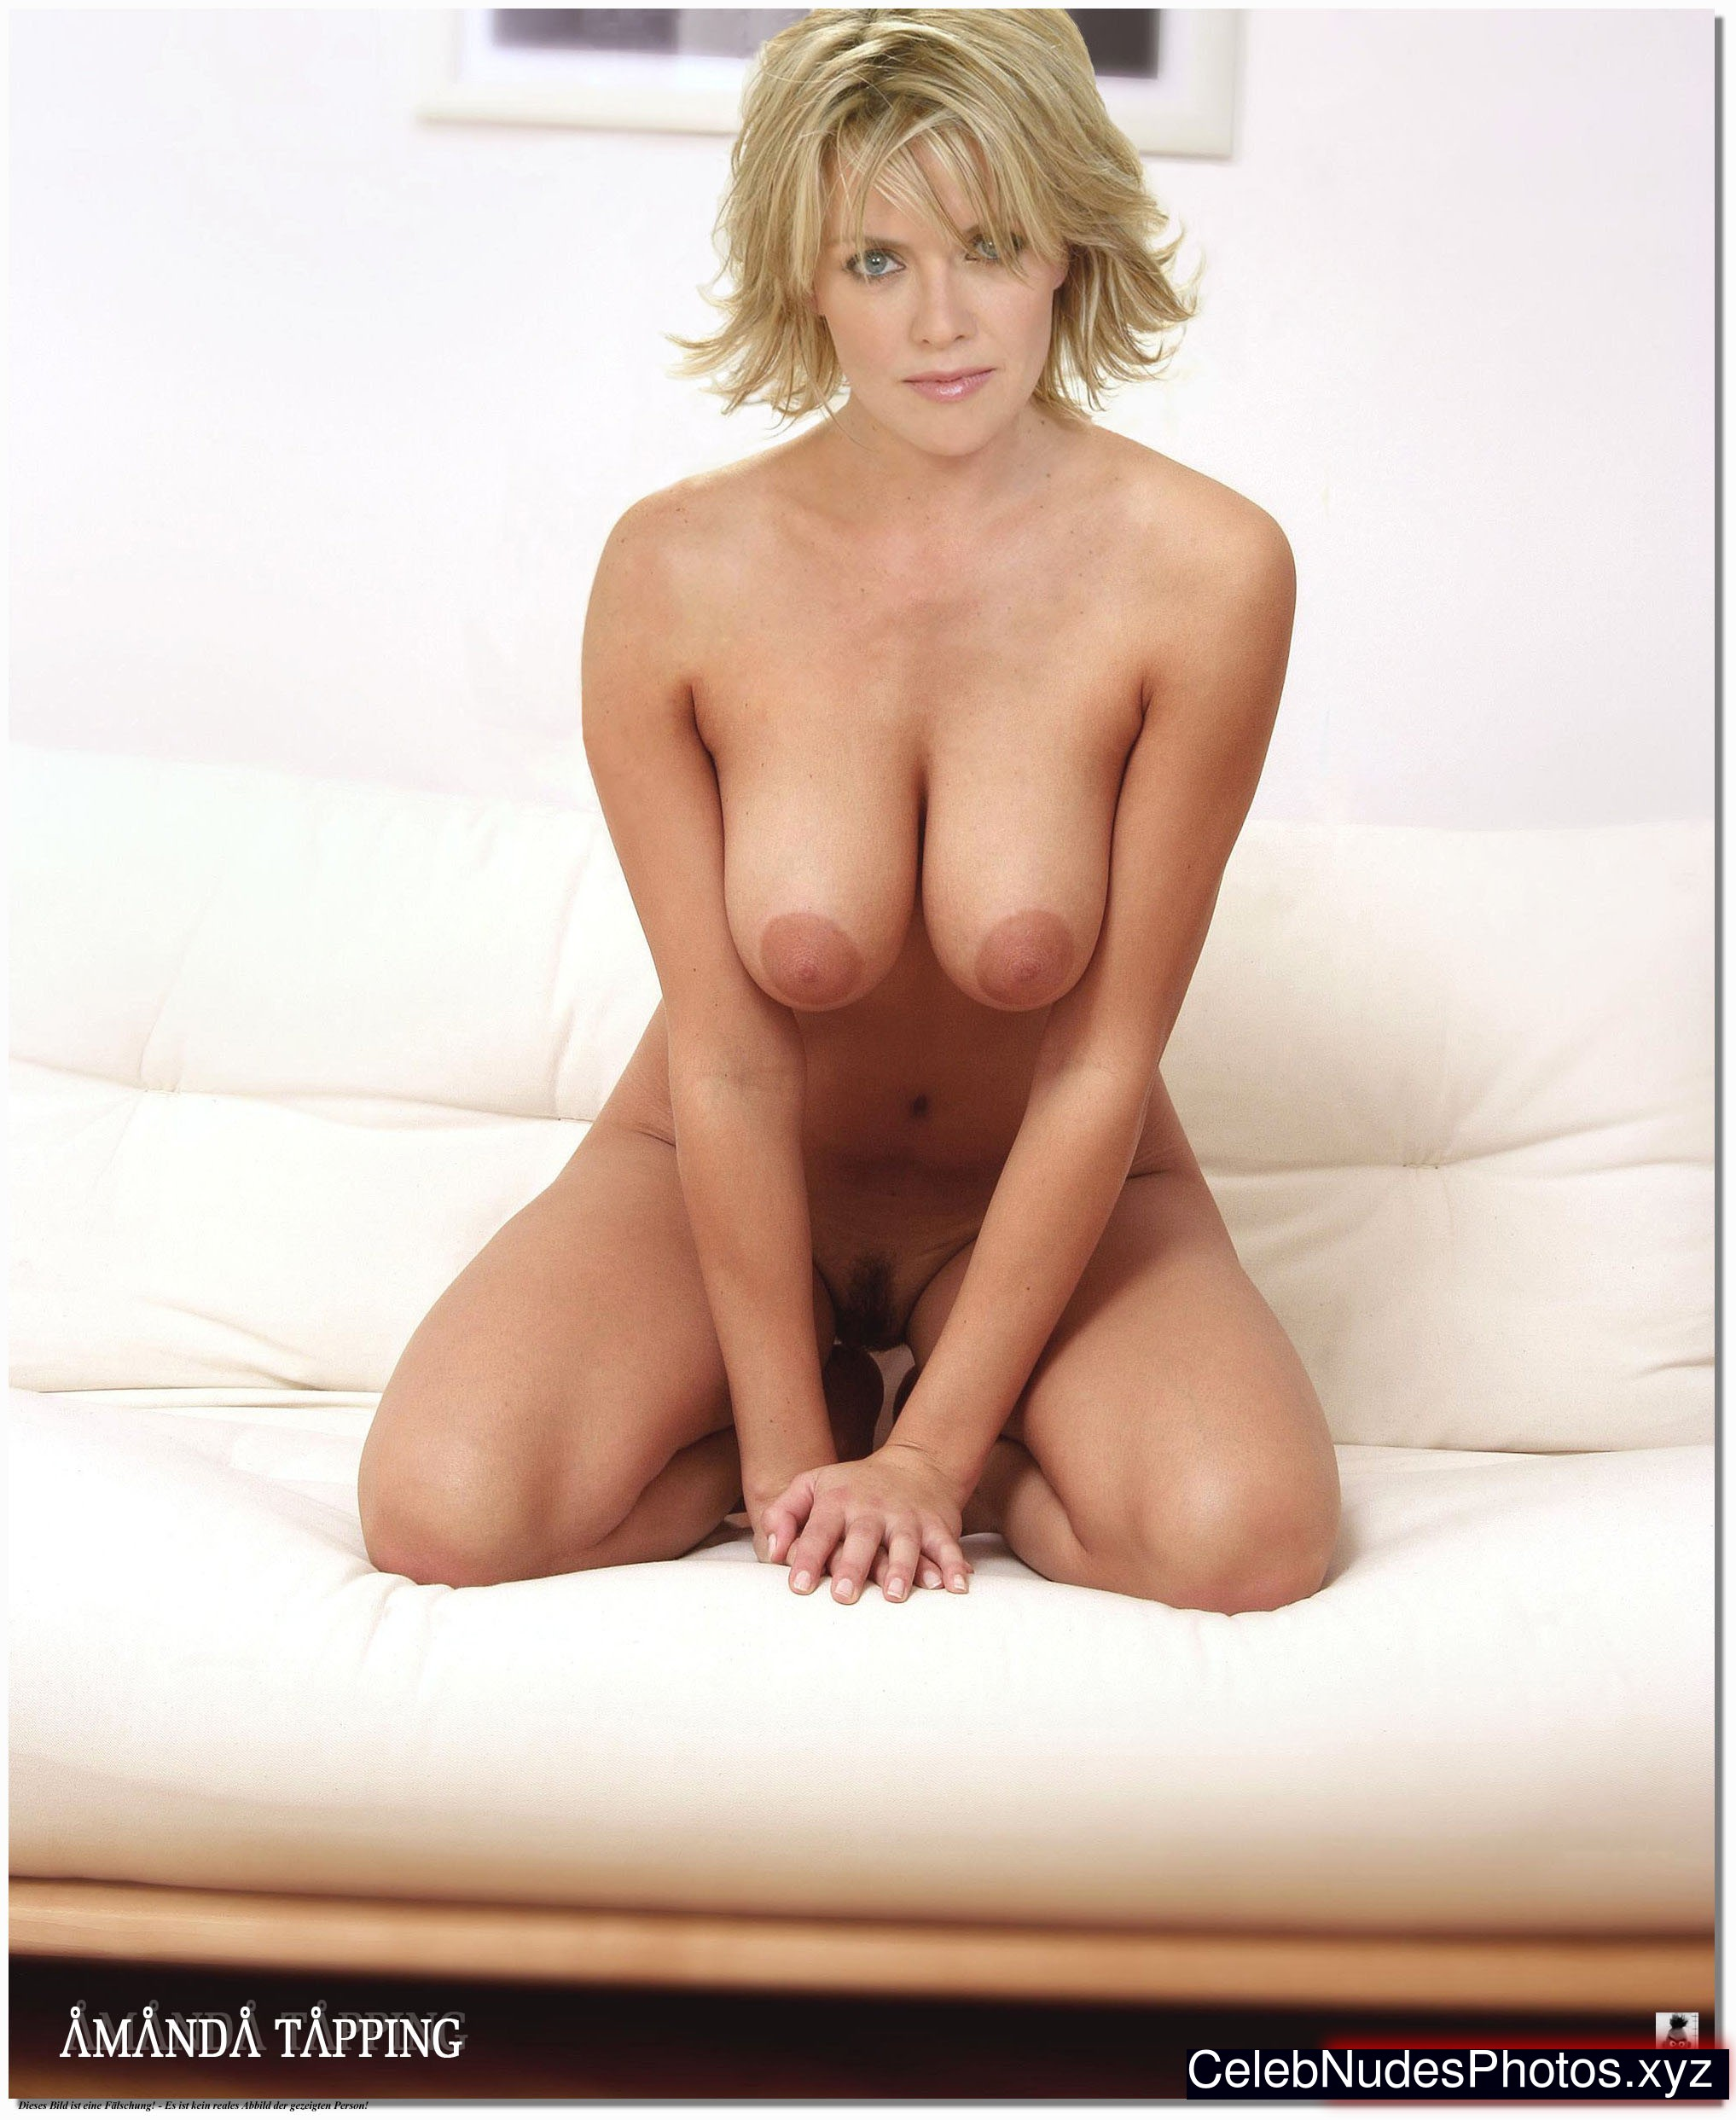 Amanda Tapping Free Nude Celeb sexy 27